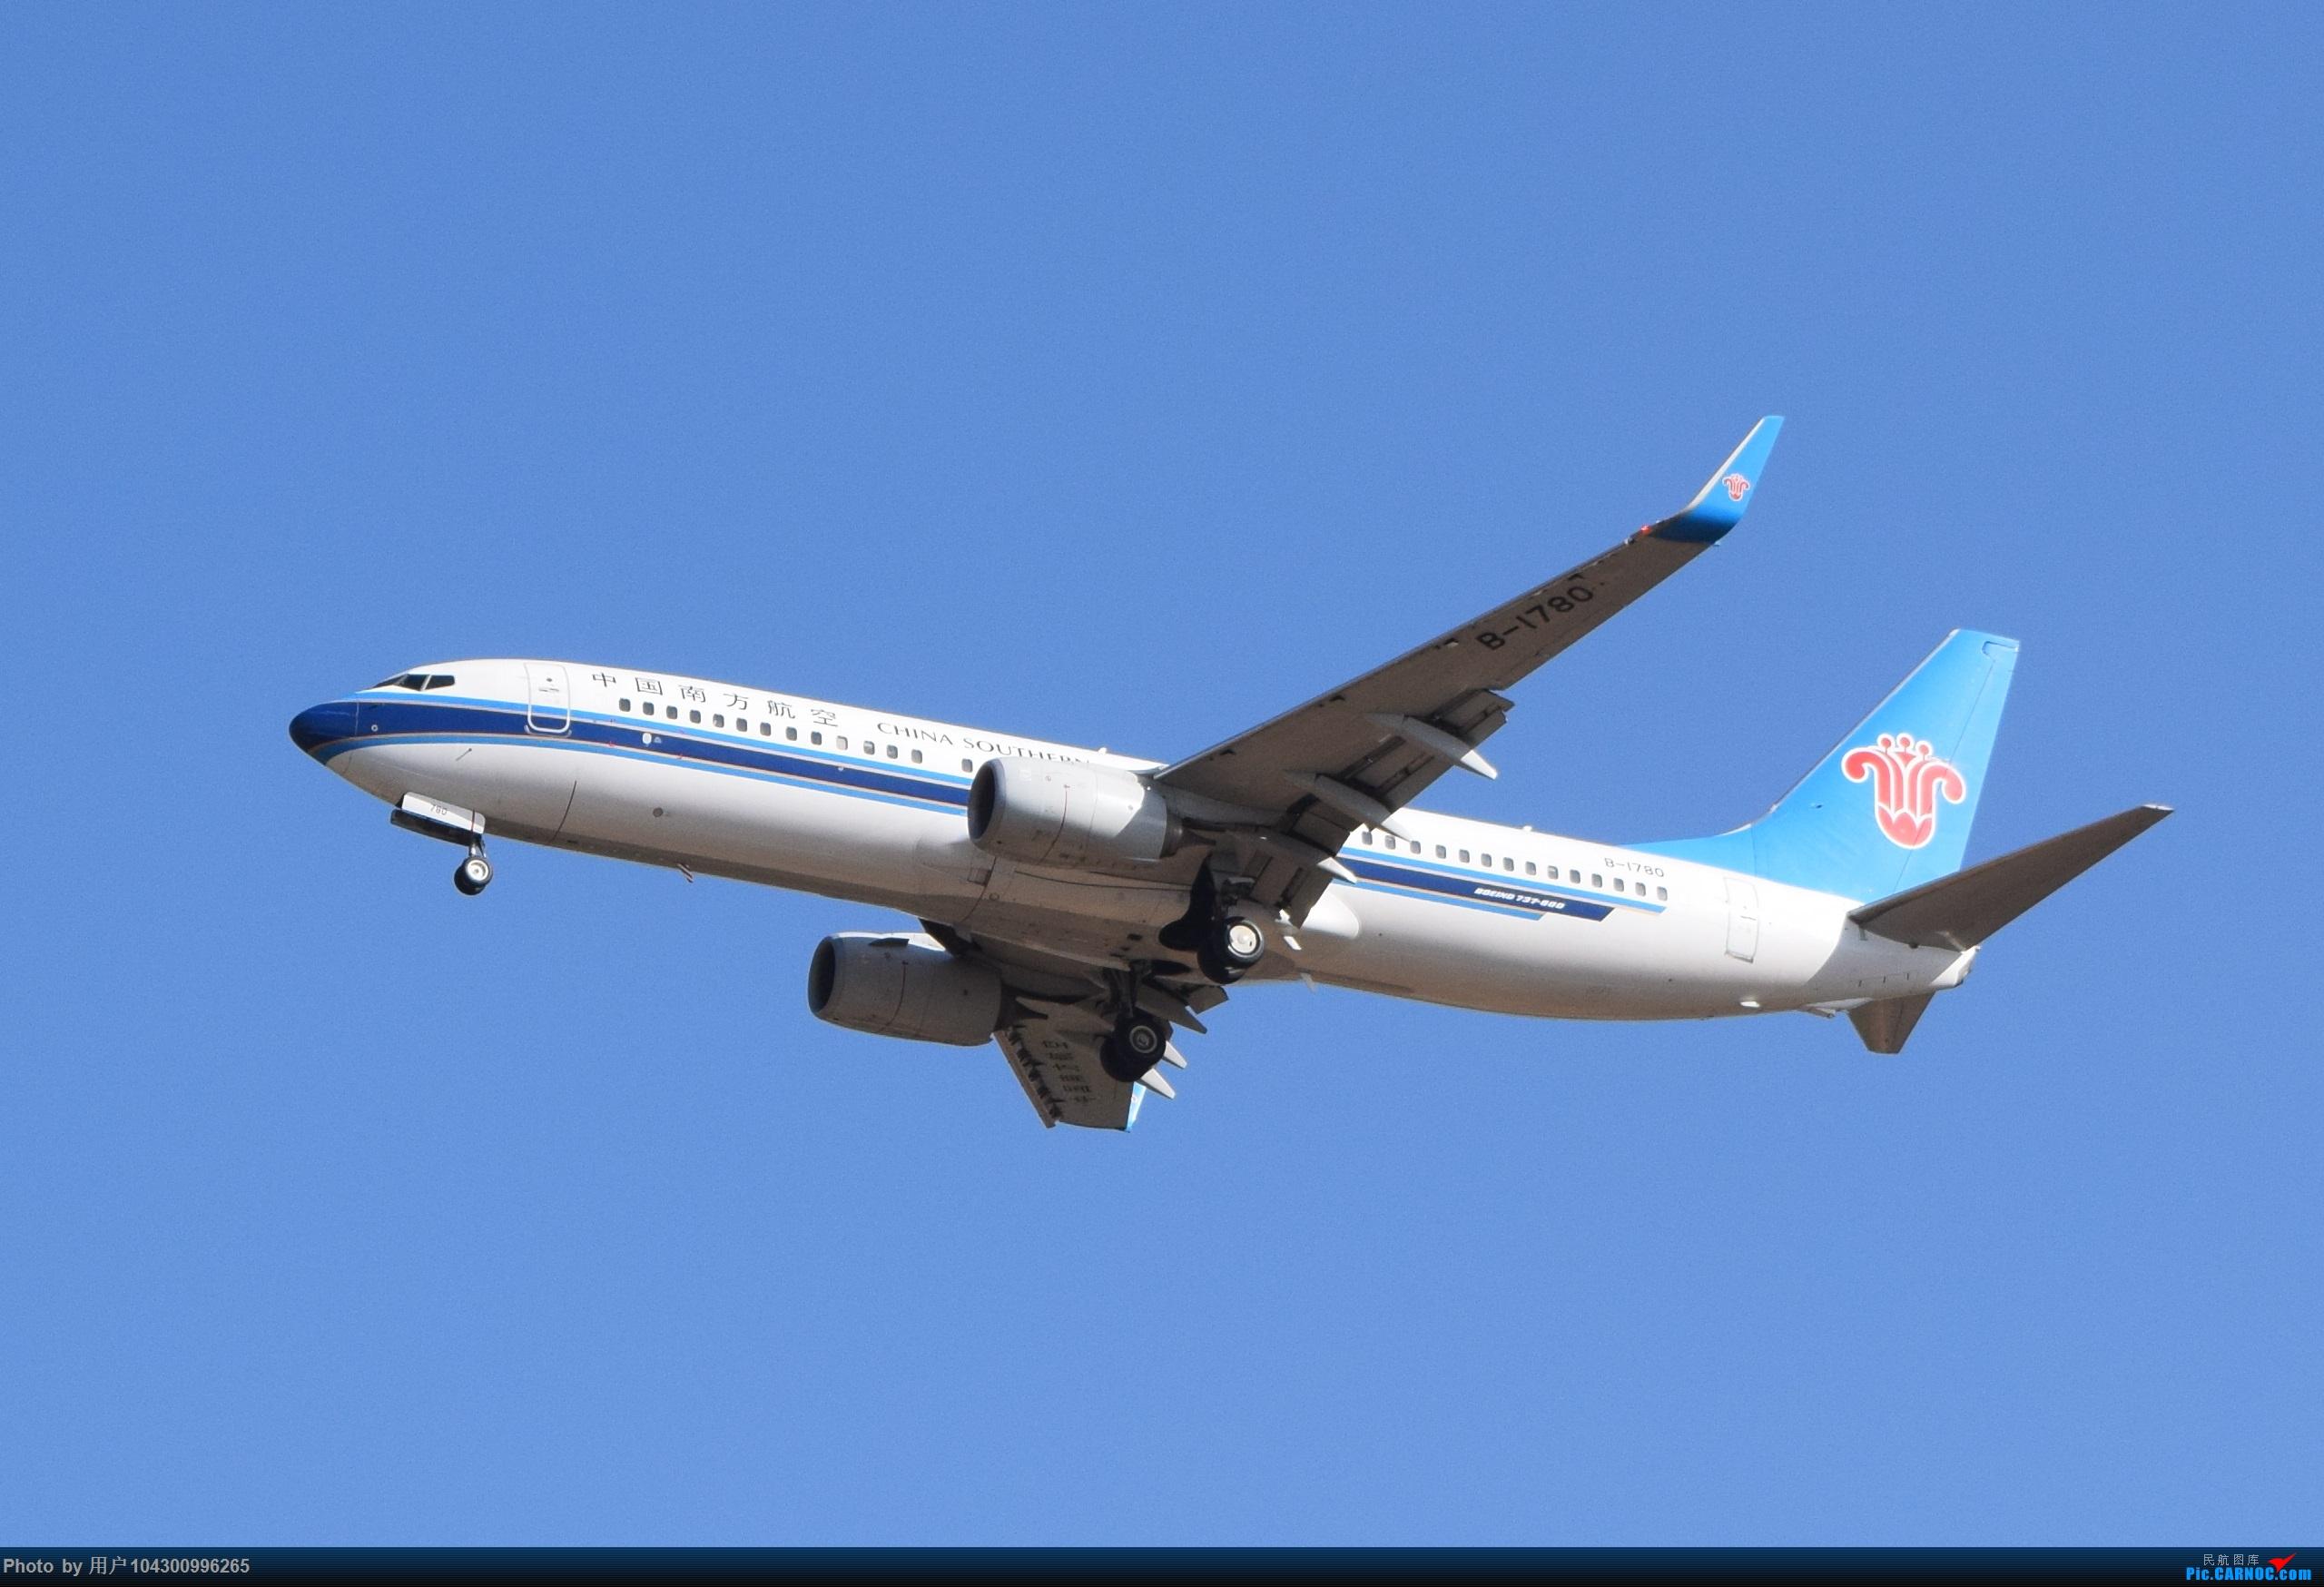 Re:[原创][KWE]贵阳今天天气不错,随便拍几张! BOEING 737-800 B-1780 中国贵阳龙洞堡国际机场